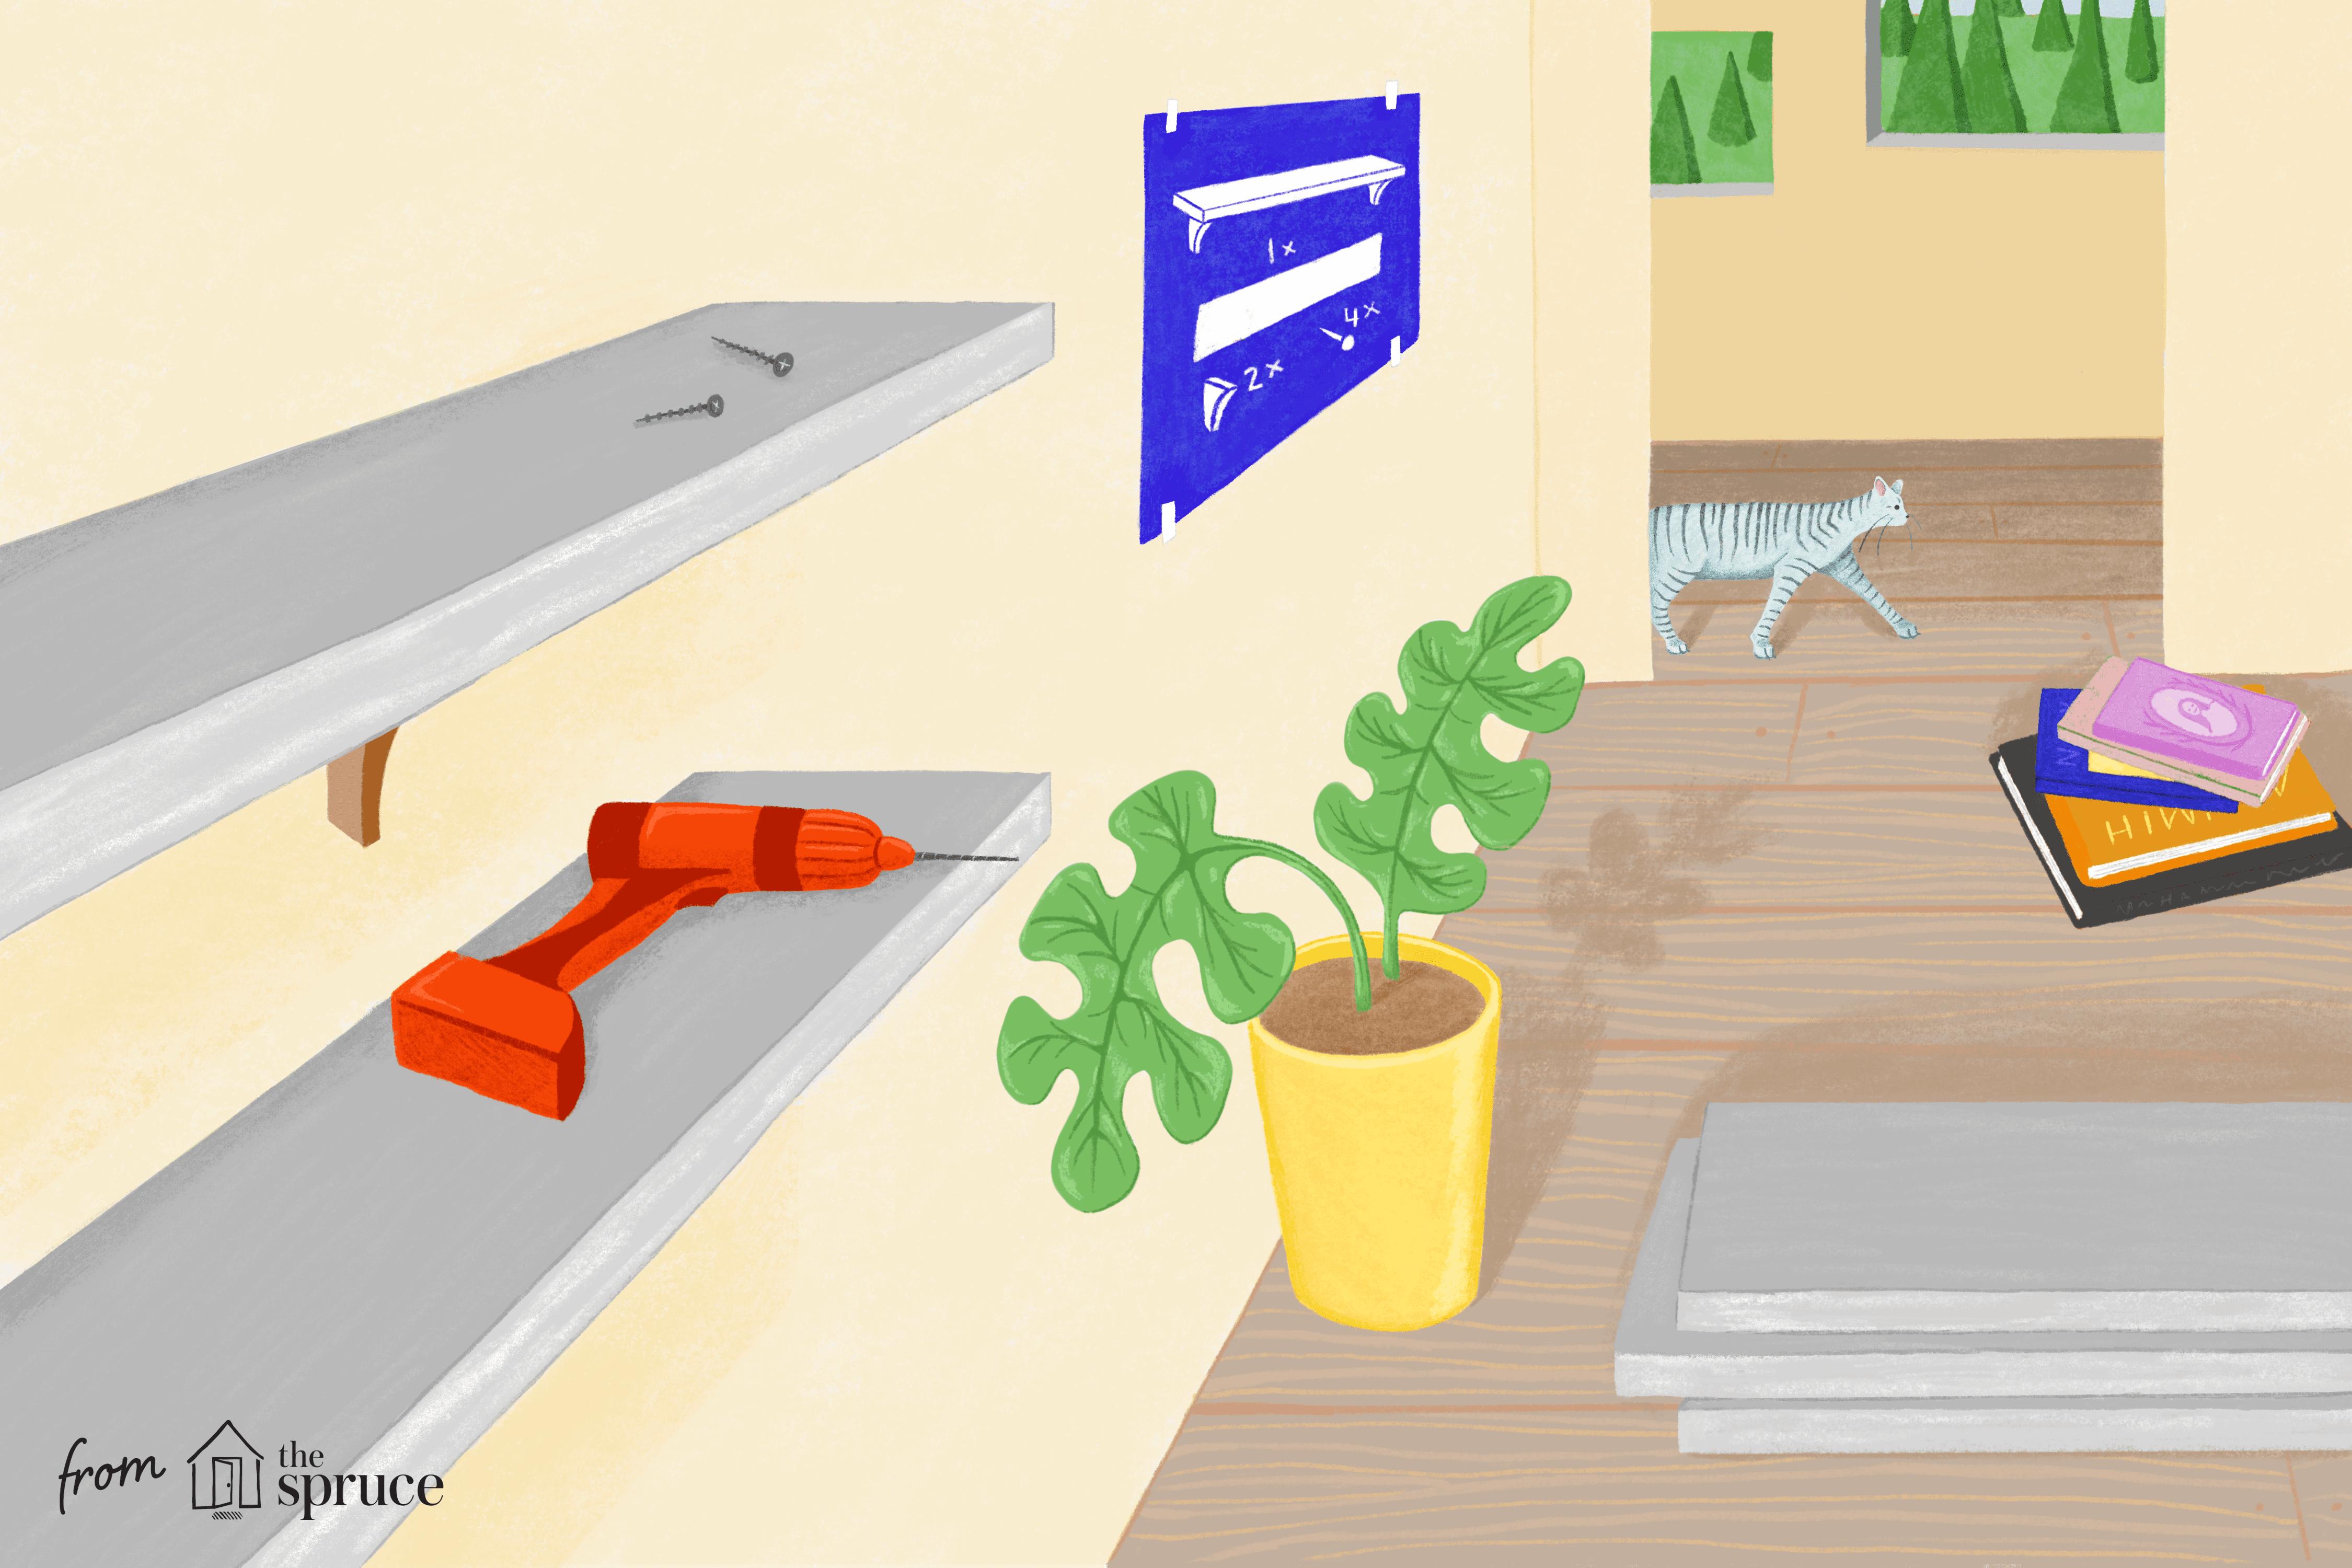 Illustration of shelves being built